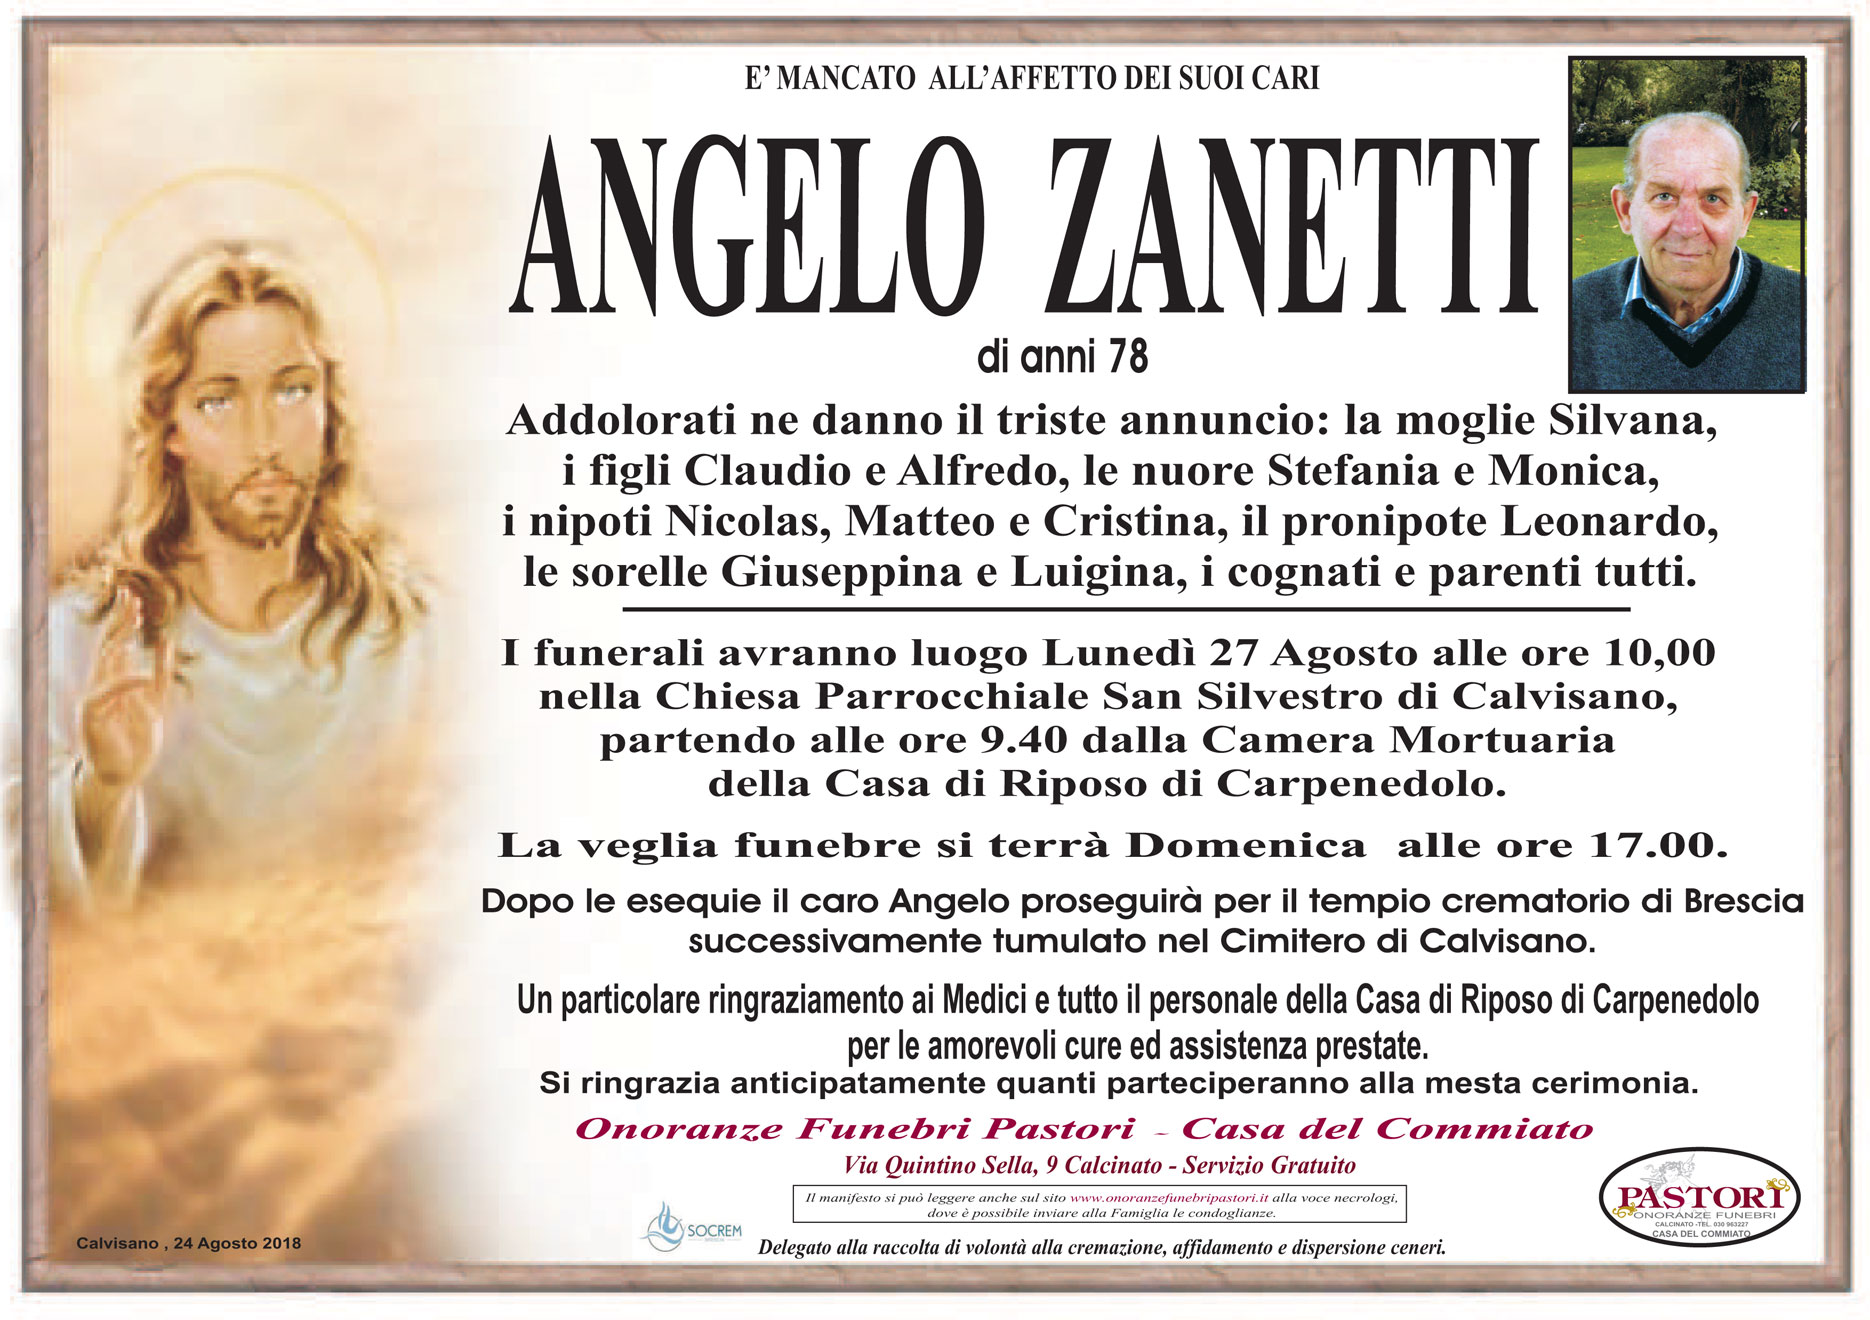 Angelo Zanetti